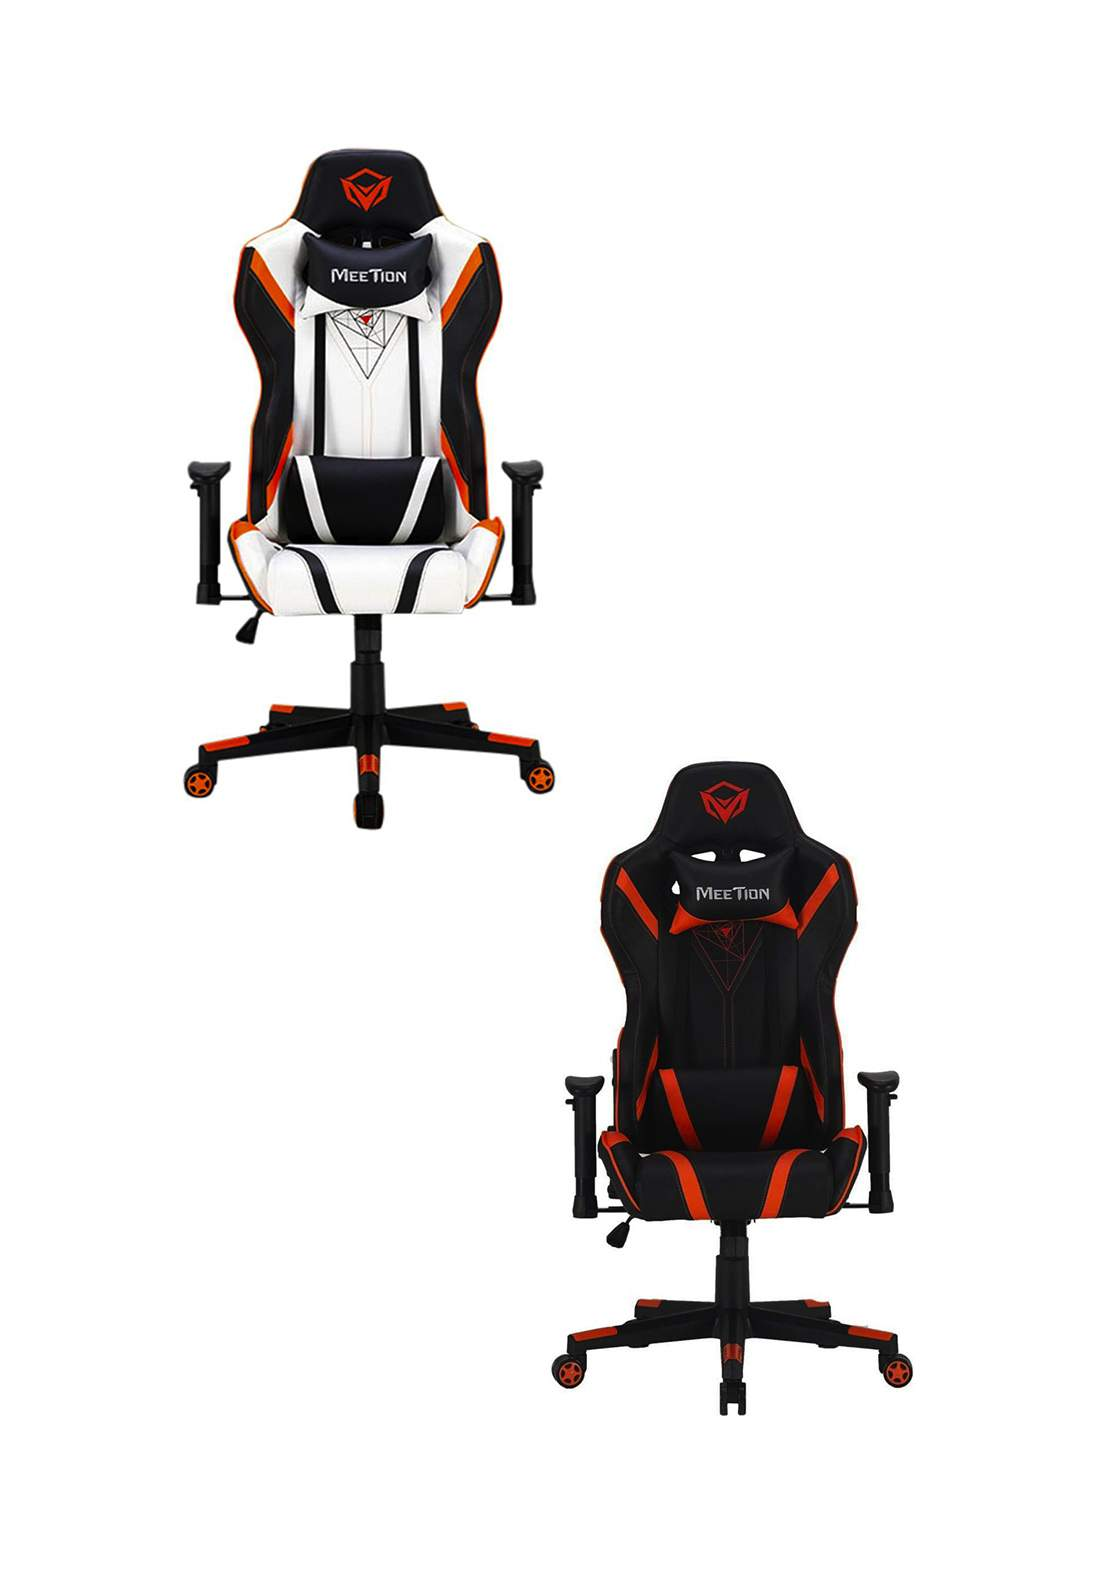 Meetion CHR15 180 ° Adjustable Gaming Chair كرسي ألعاب